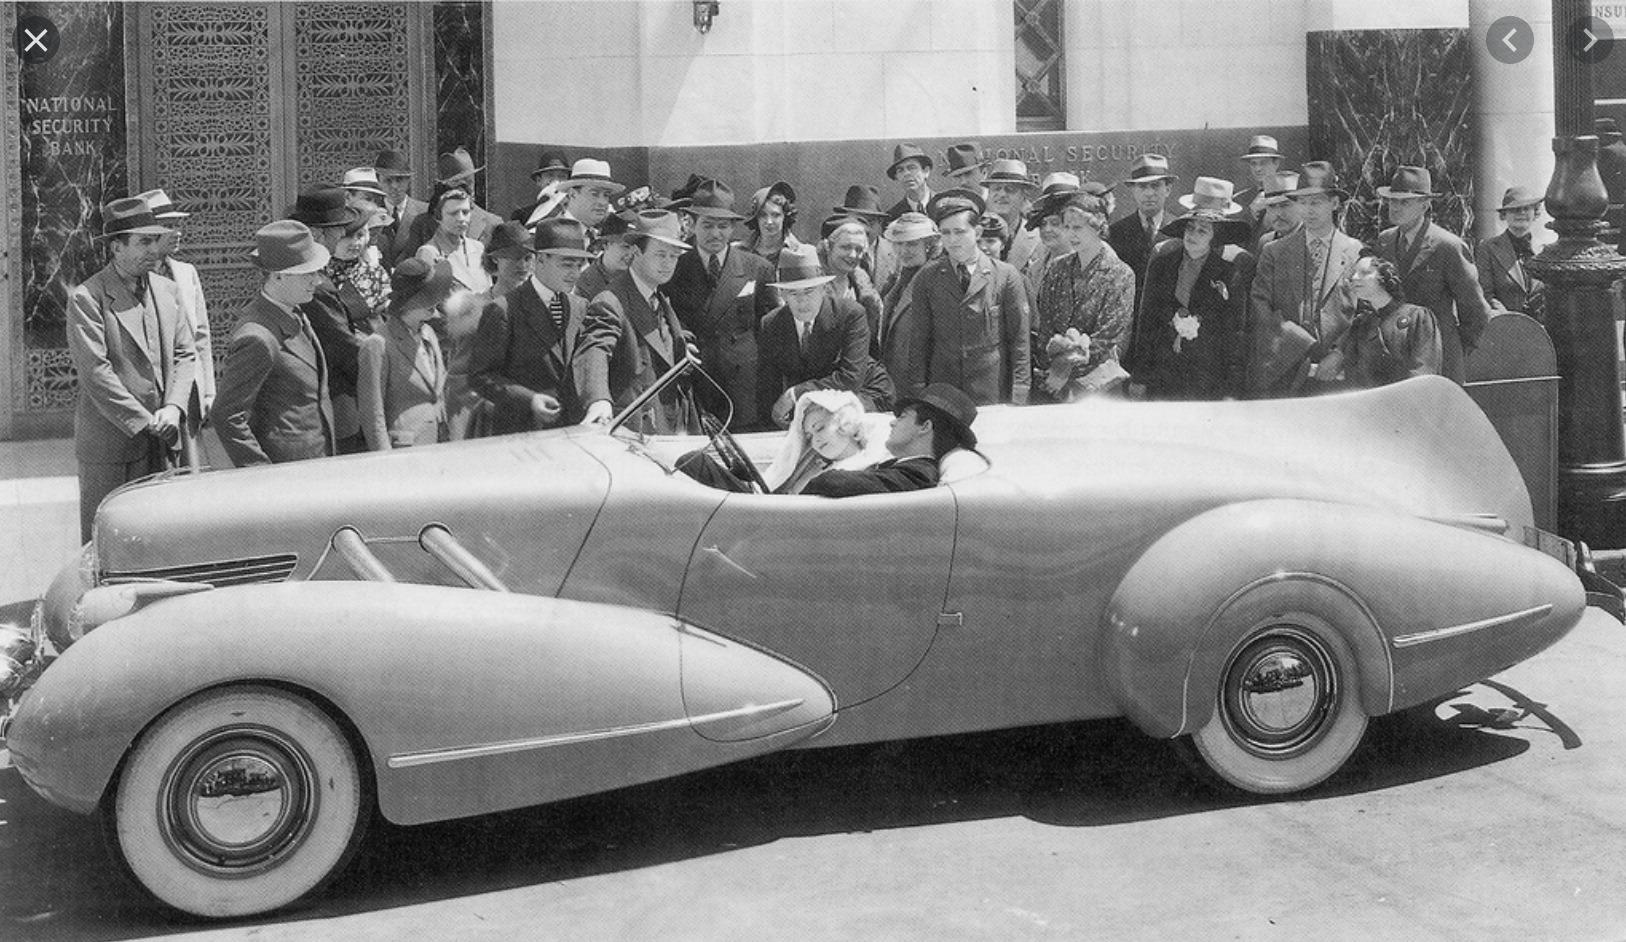 Buick1936with BohmanandSchwartzbodyTopperFilmHughGrant